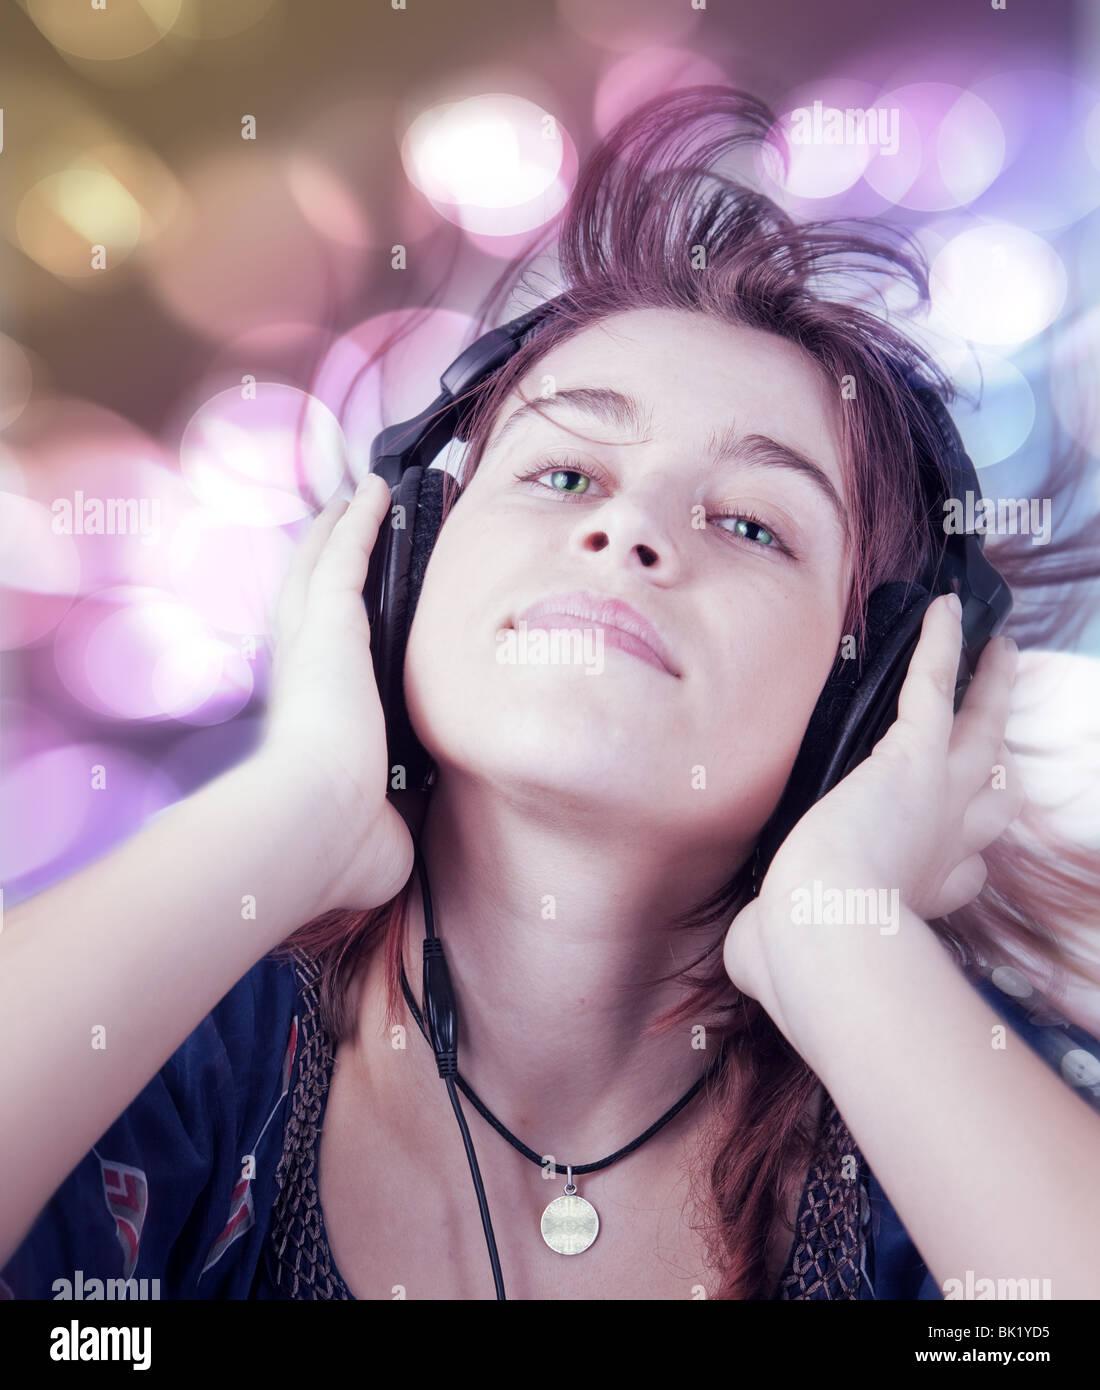 Young Teen Dancing Nightclub Stockfotos & Young Teen